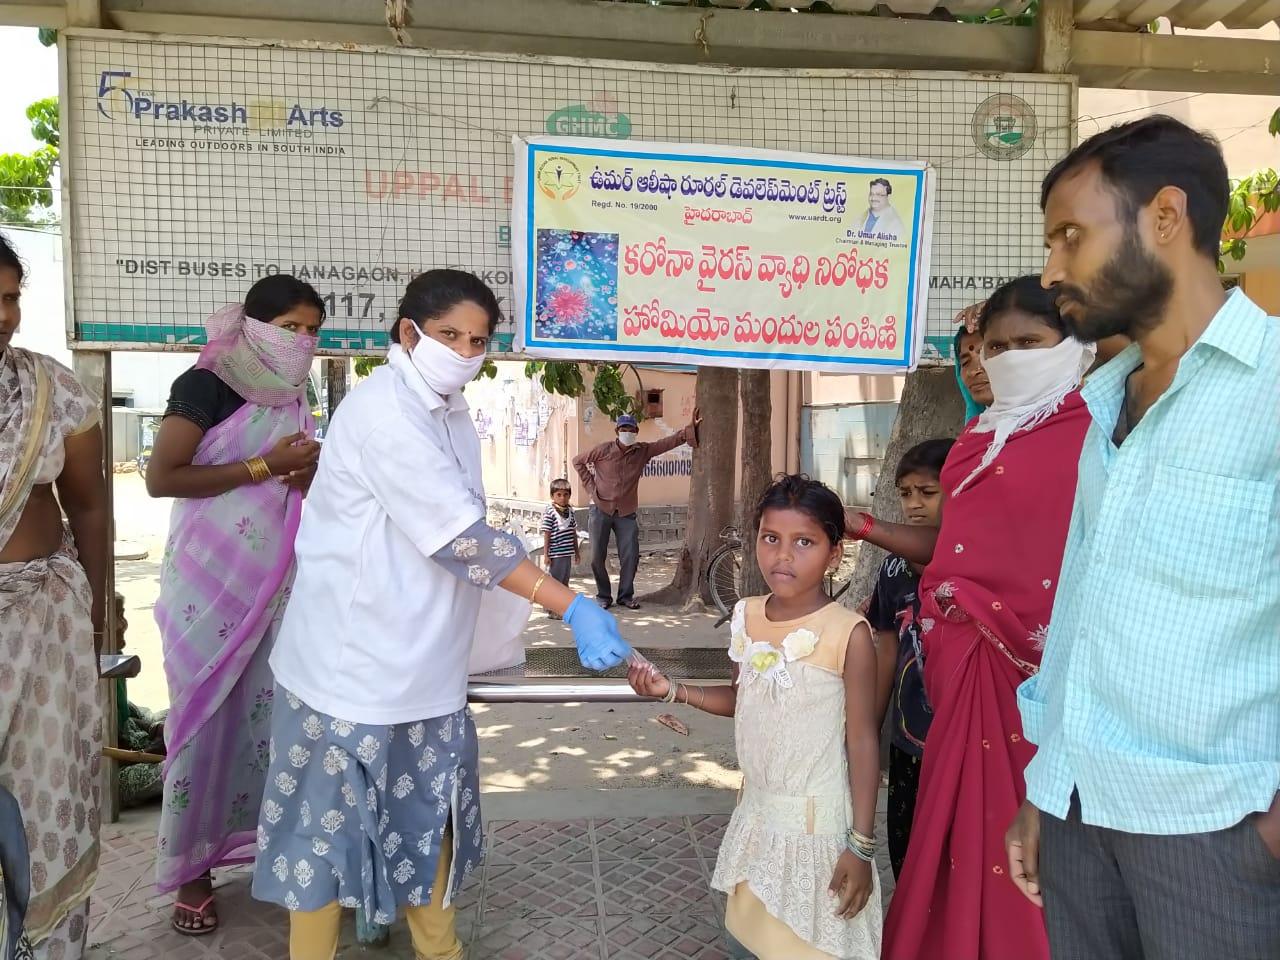 20-Coronavirus-UPPALCrossRoadsBusStop-Hyderabad-12Apr2020